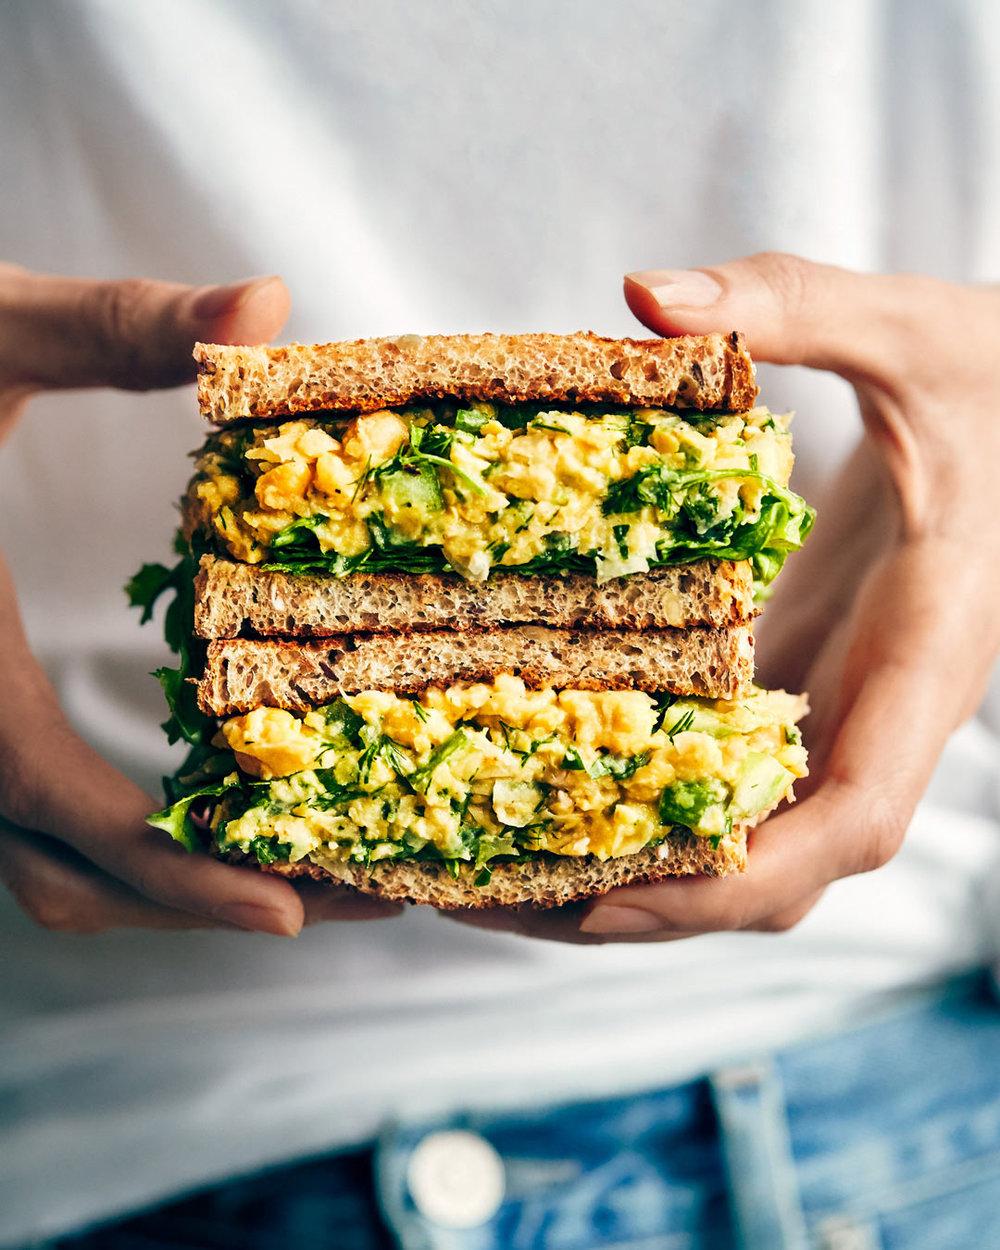 Lemon & Dill Chickpea Sandwich | Evergreen Kitchen | Vegan, gluten free (option)